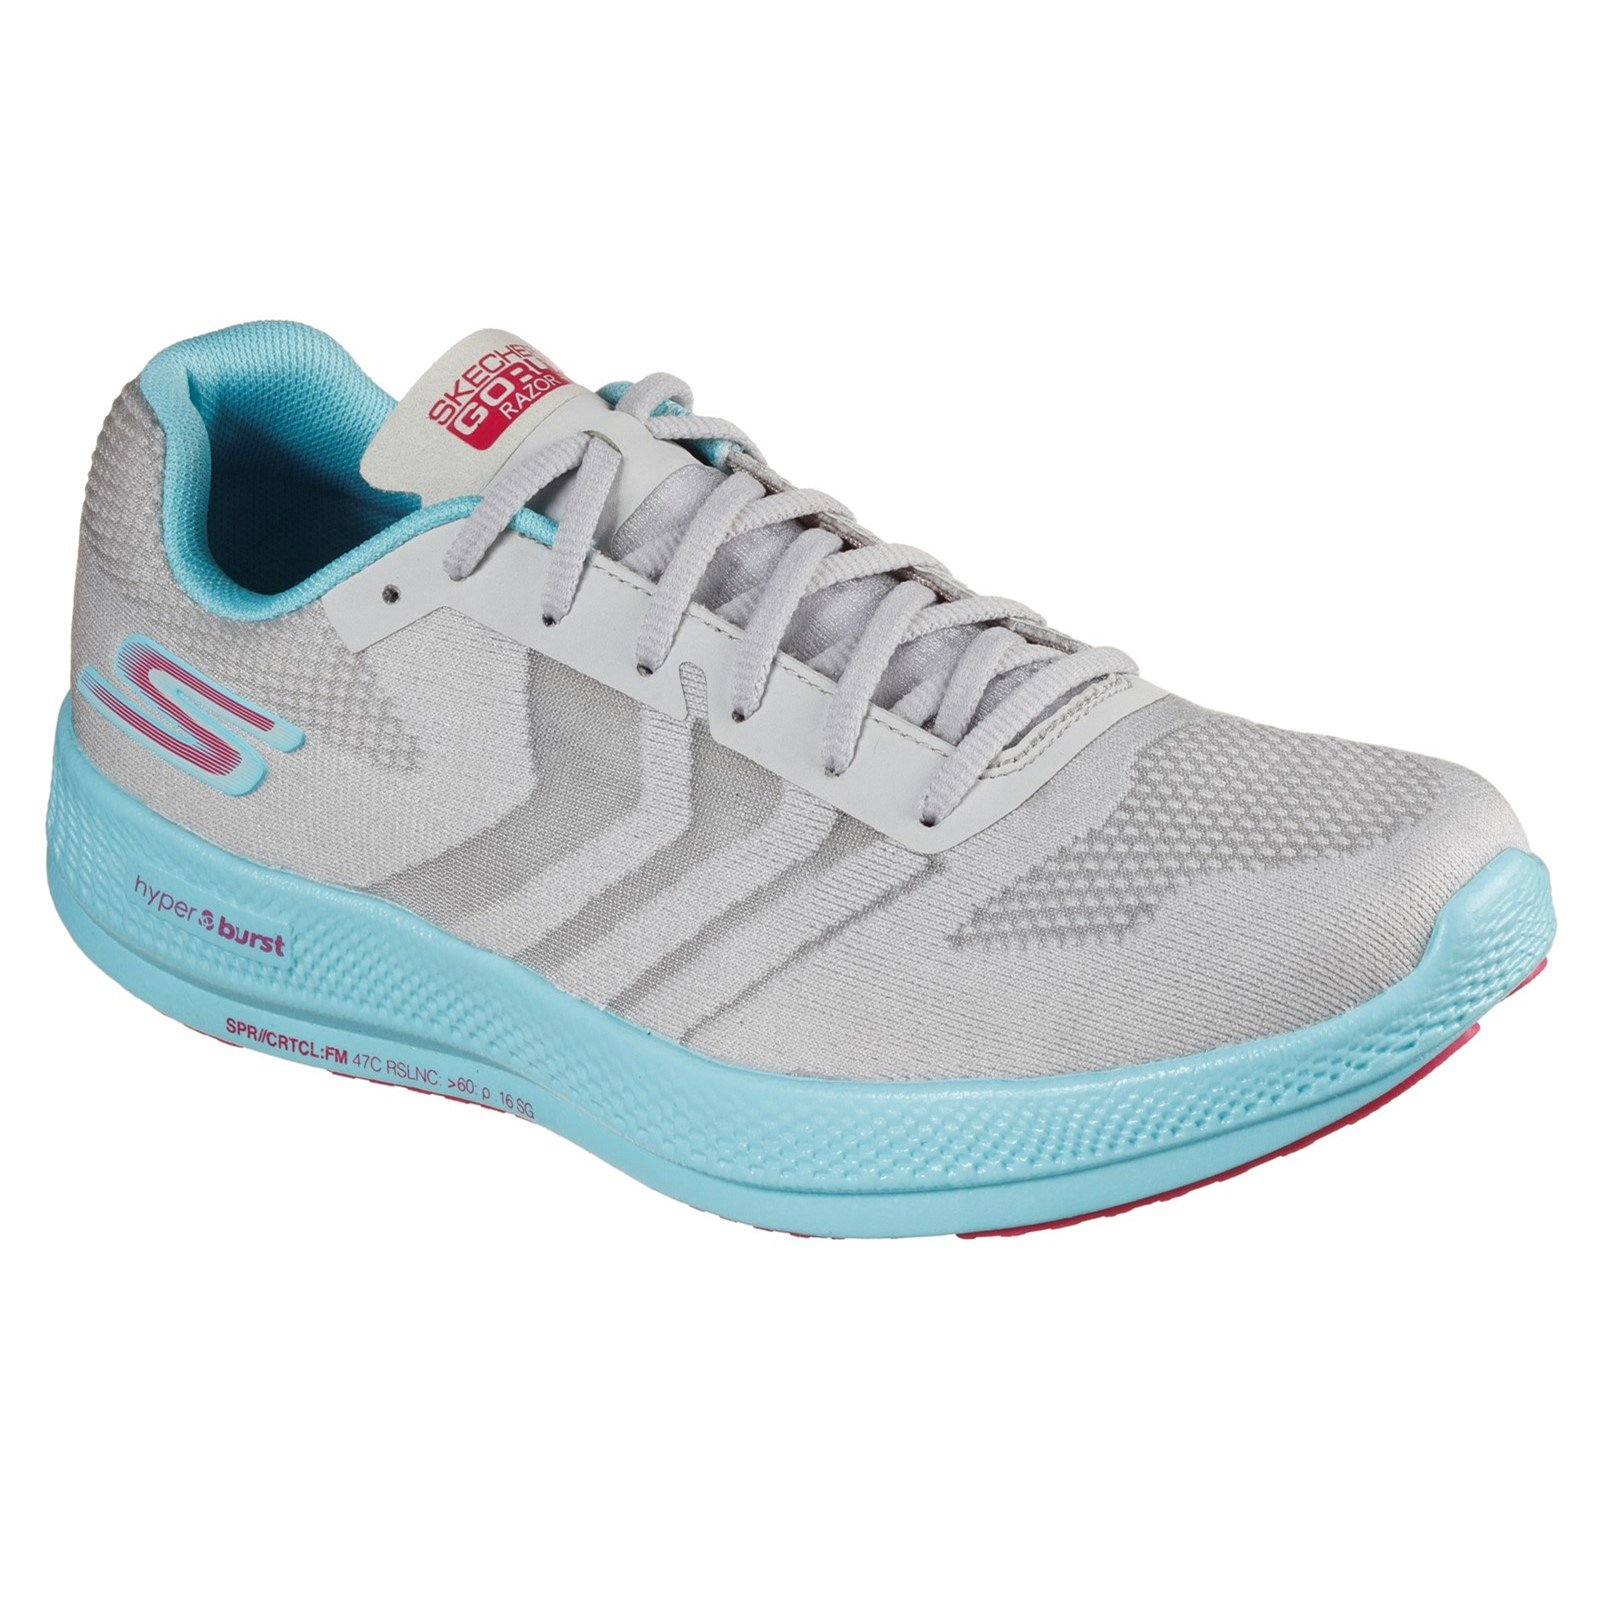 Skechers Women's Go Run Razor Trainer Various Colours 32703 - Grey/Aqua/Pink 8